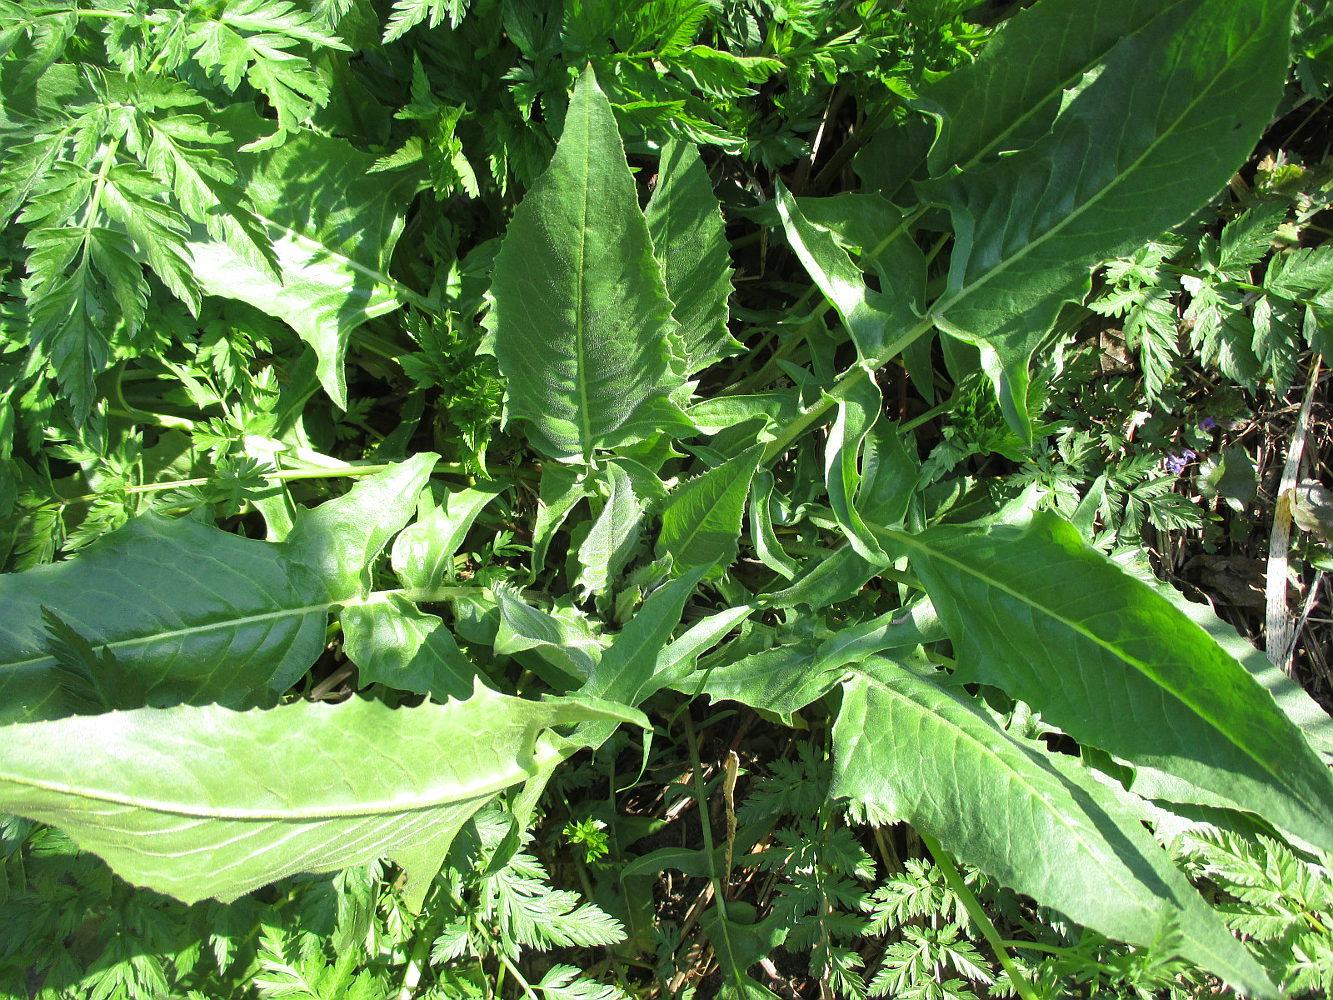 Warty cabbage - Bunias orientalis 37